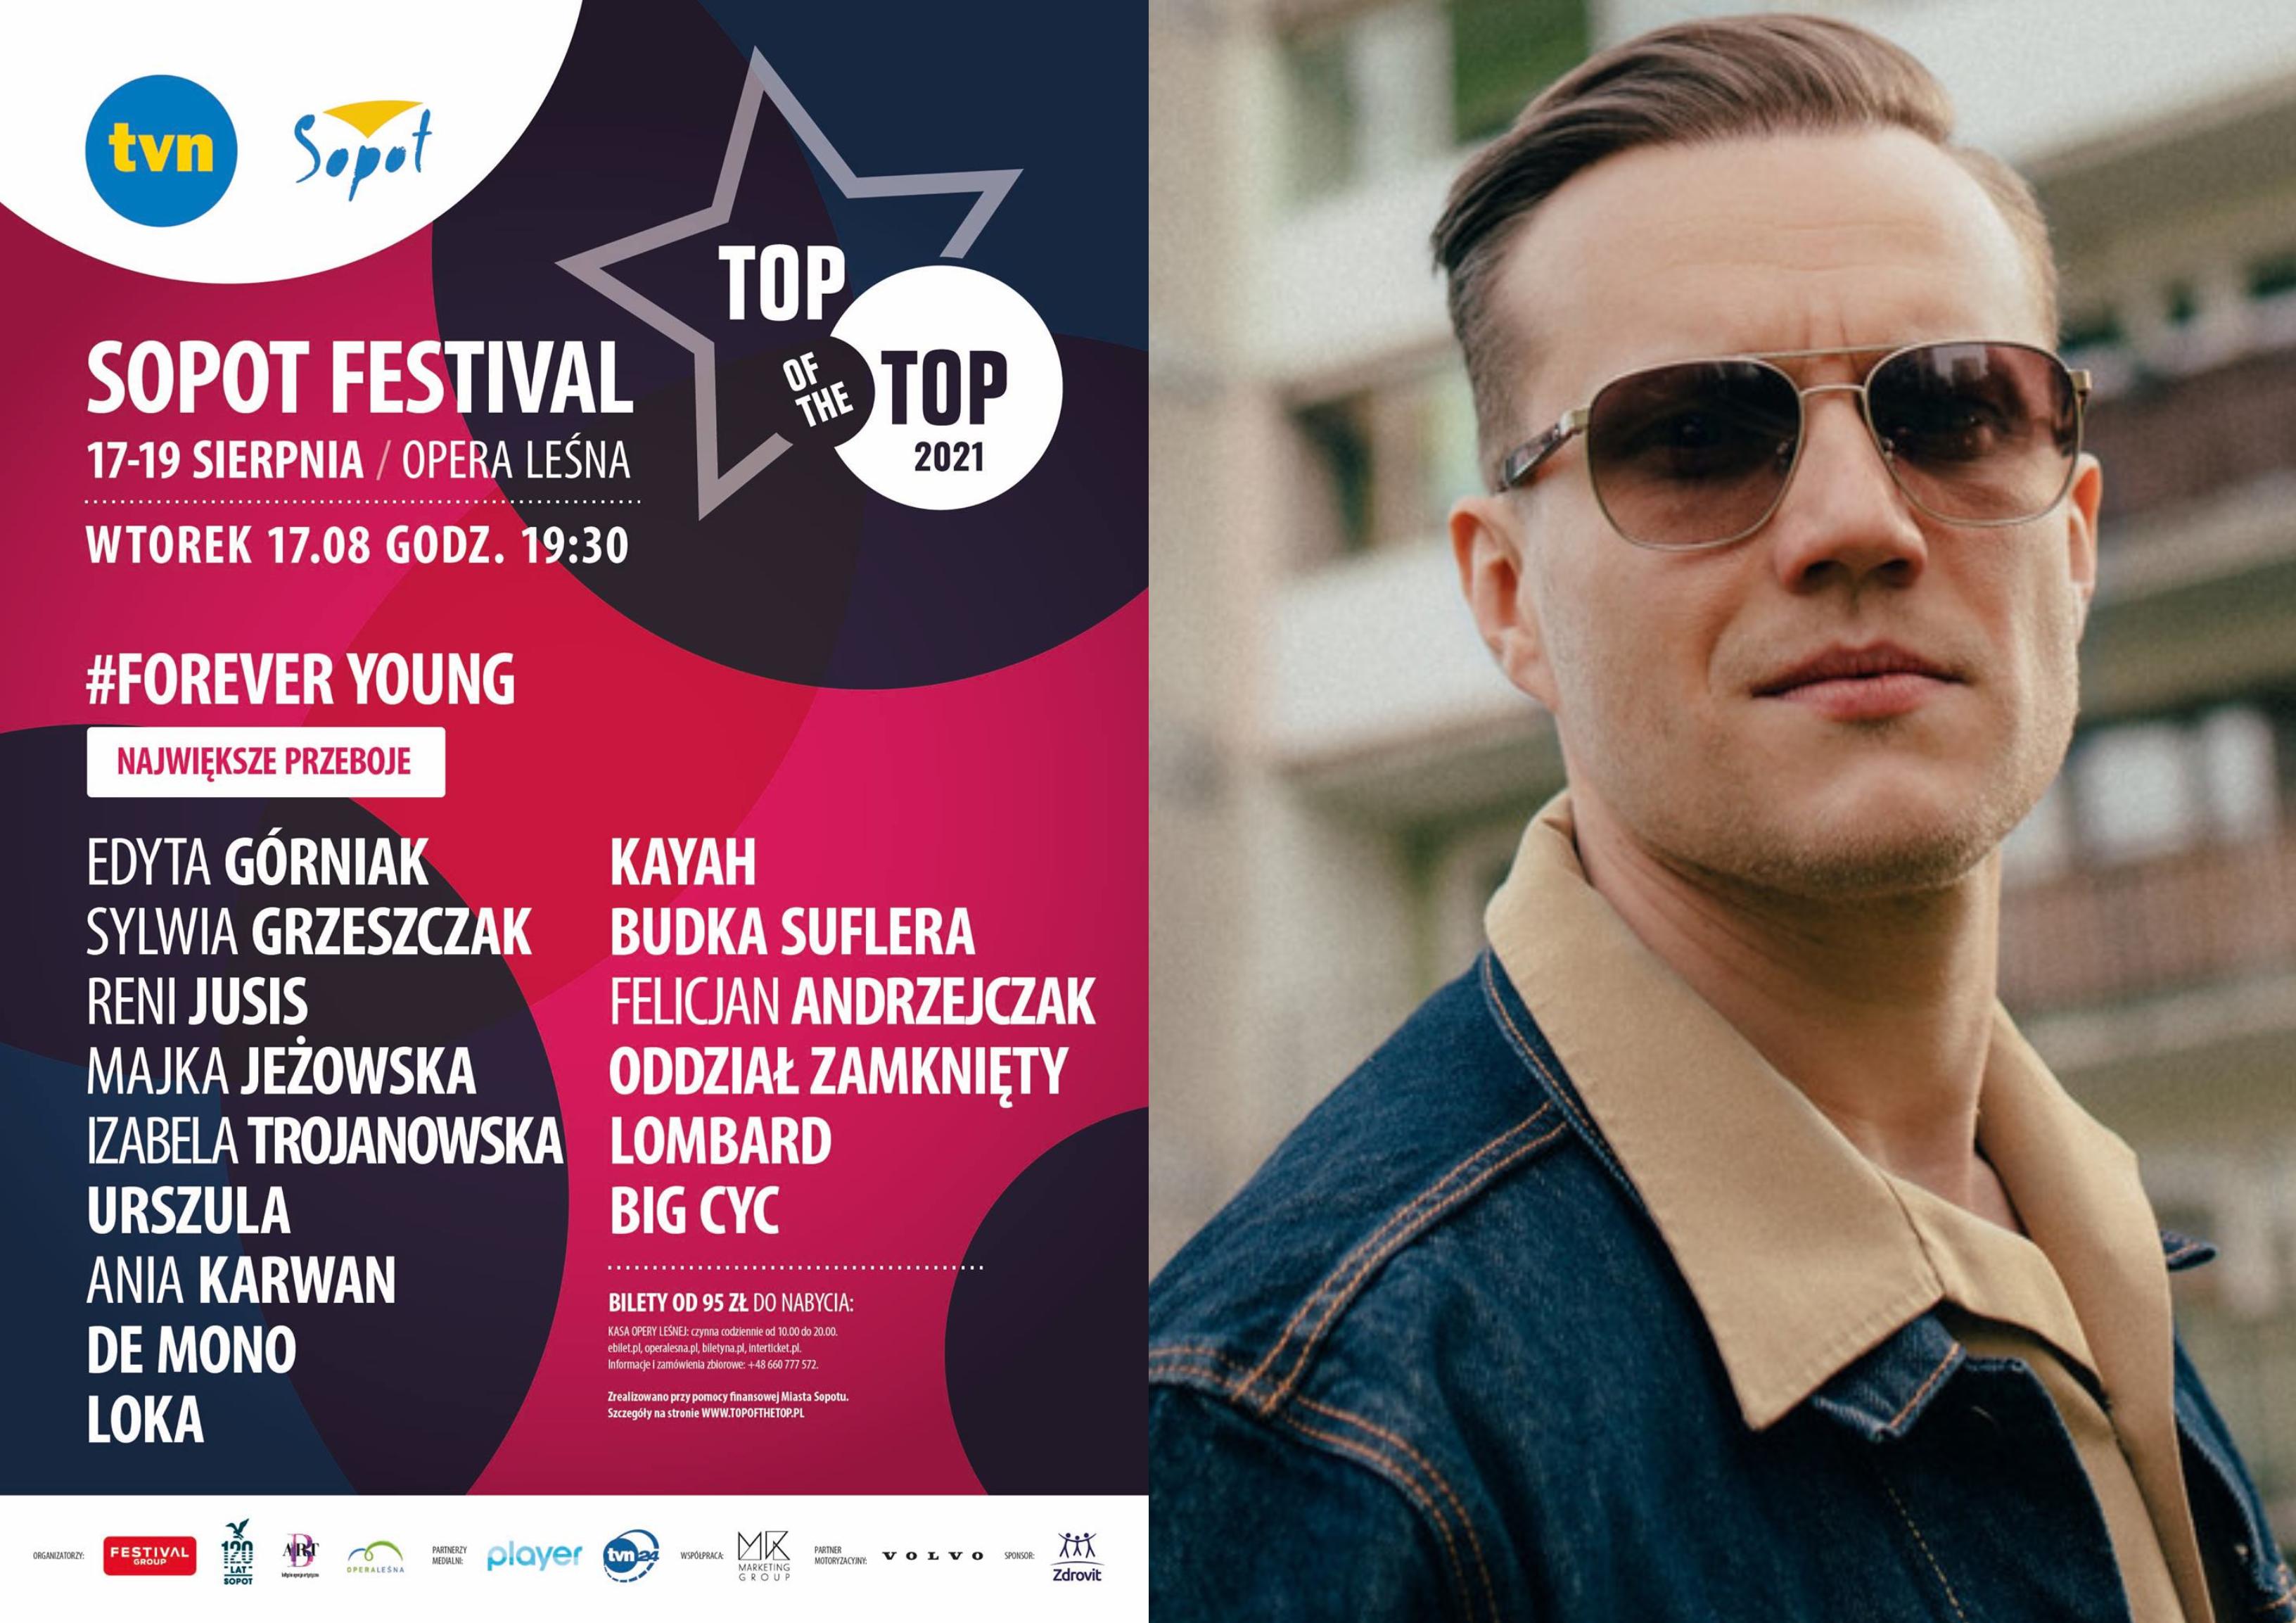 TOP OF THE TOP Sopot Festival 2021: Wtorek 17.08 o godz. 19:30: #FOREVER YOUNG & #I LOVE SOPOT / fot. Facebook.com (@SopotTopOfTheTopFestival)